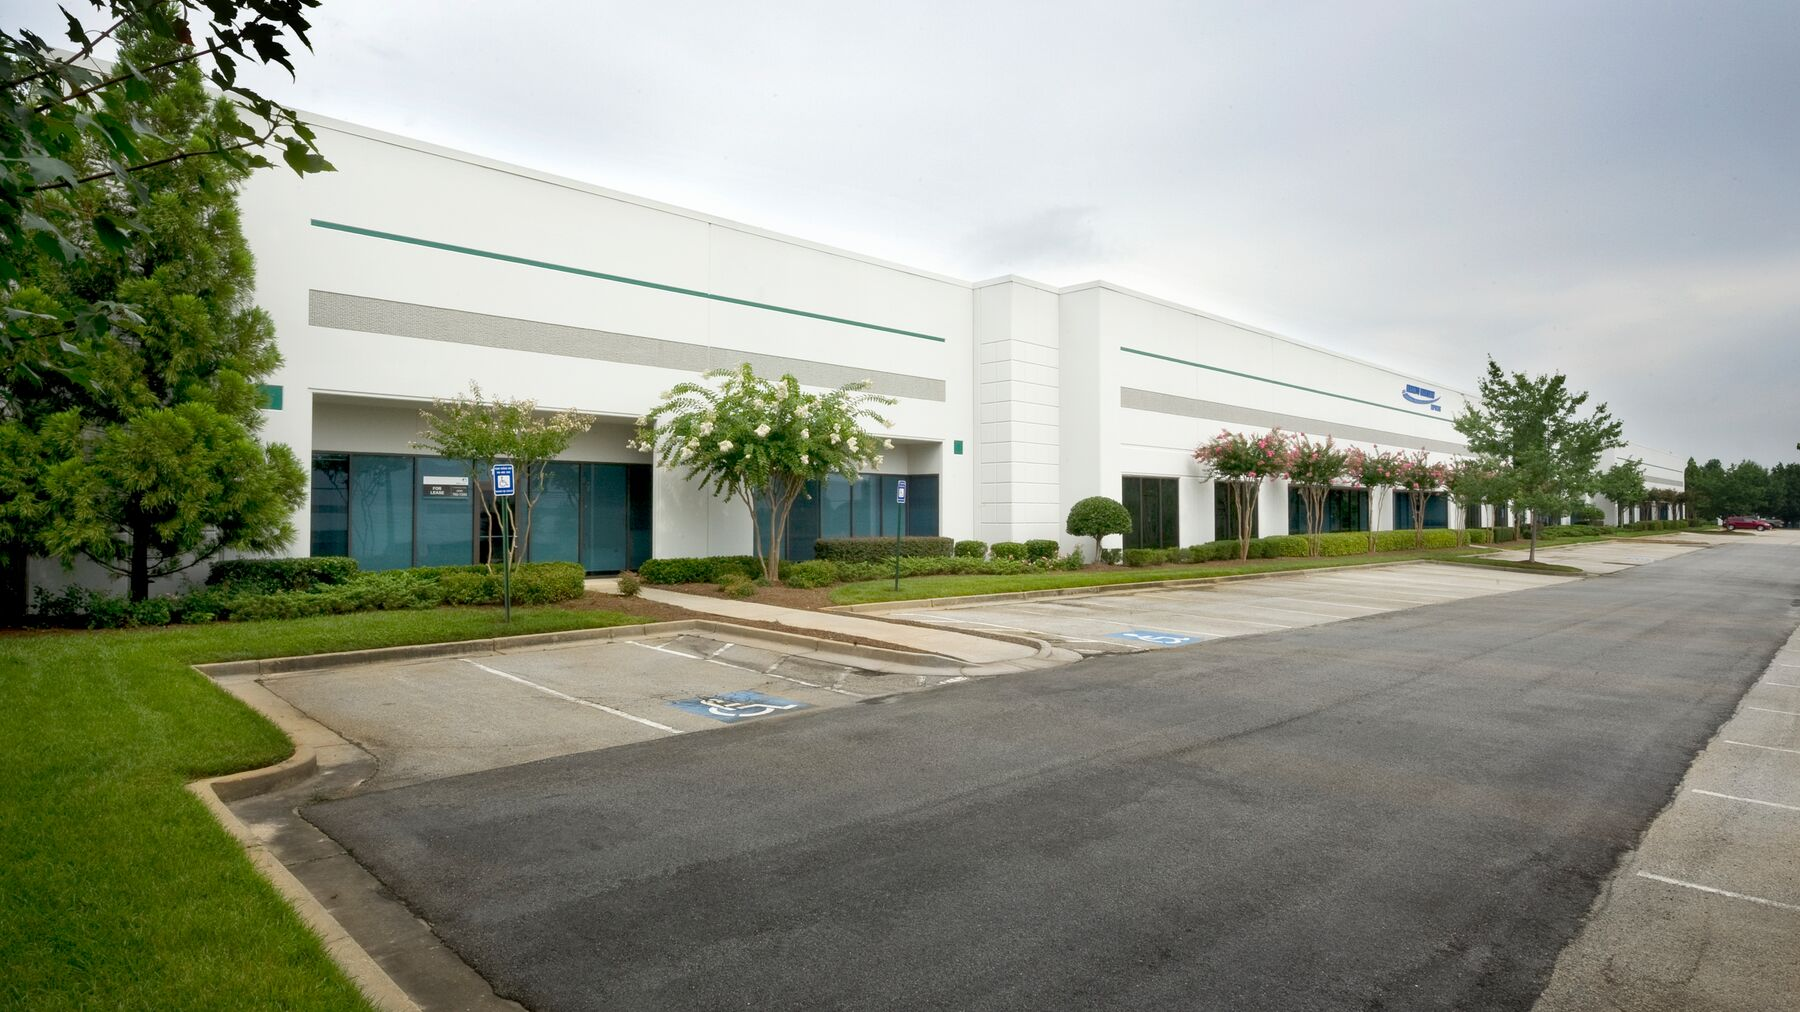 DPM-Airport-South-4_-4.jpg